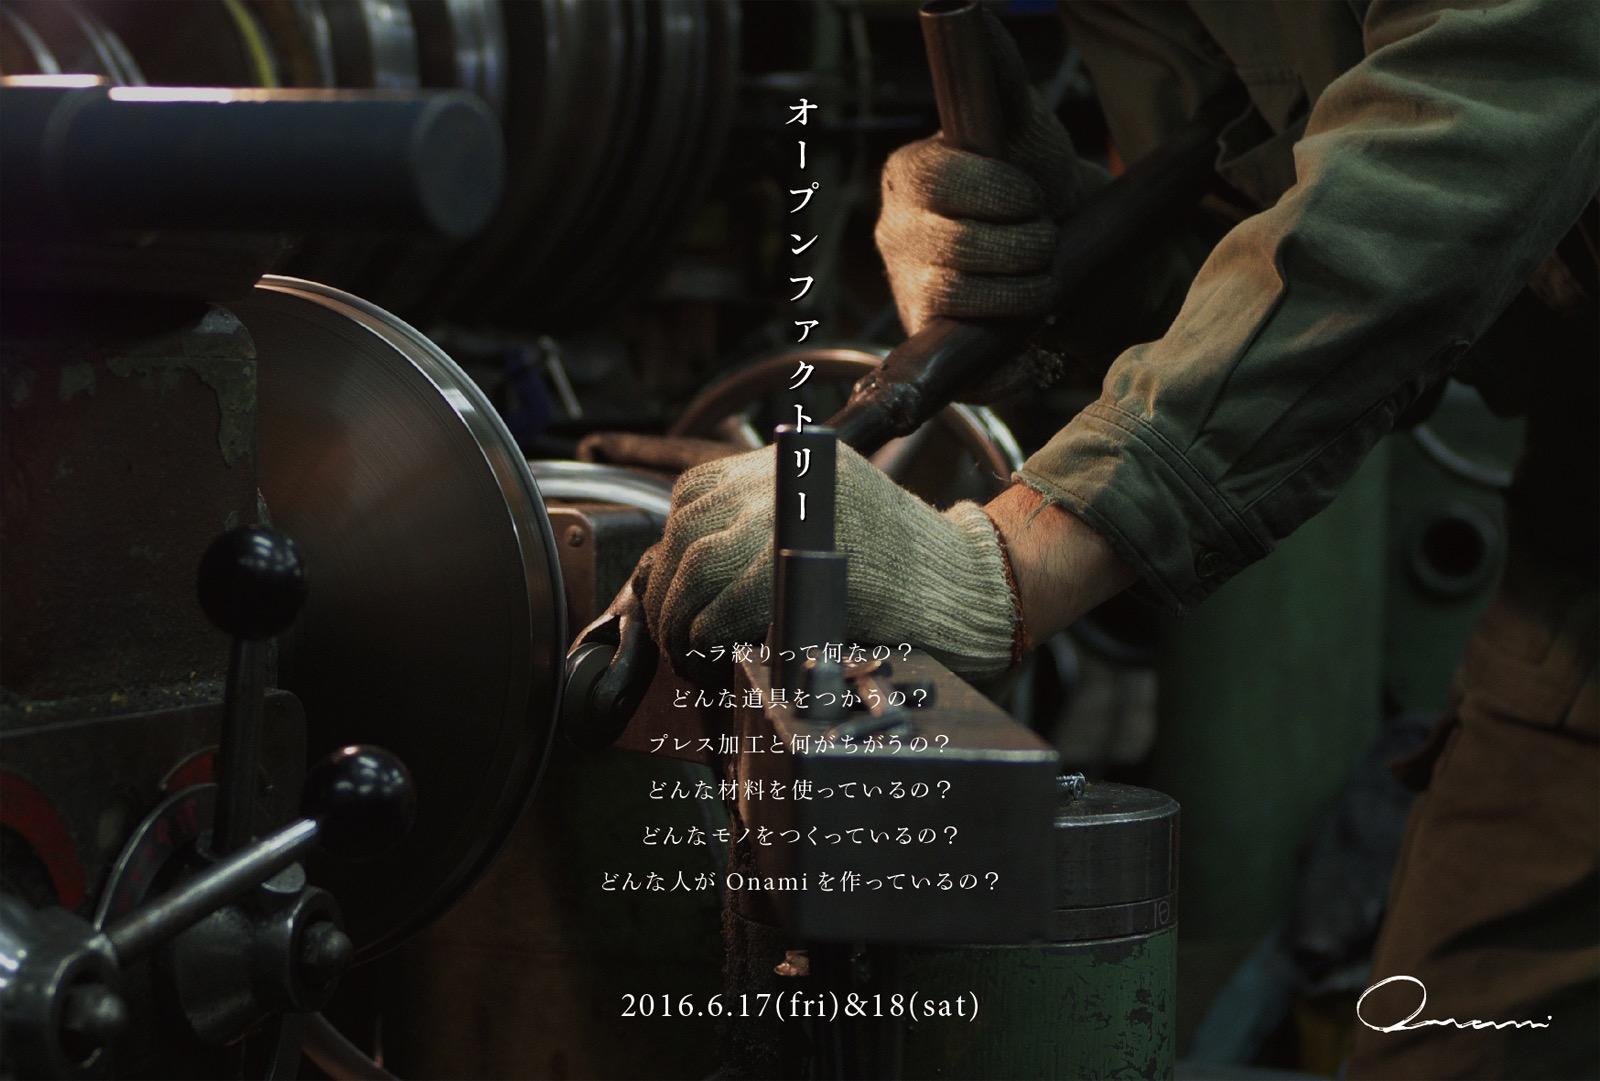 Onami Open Factory 2016